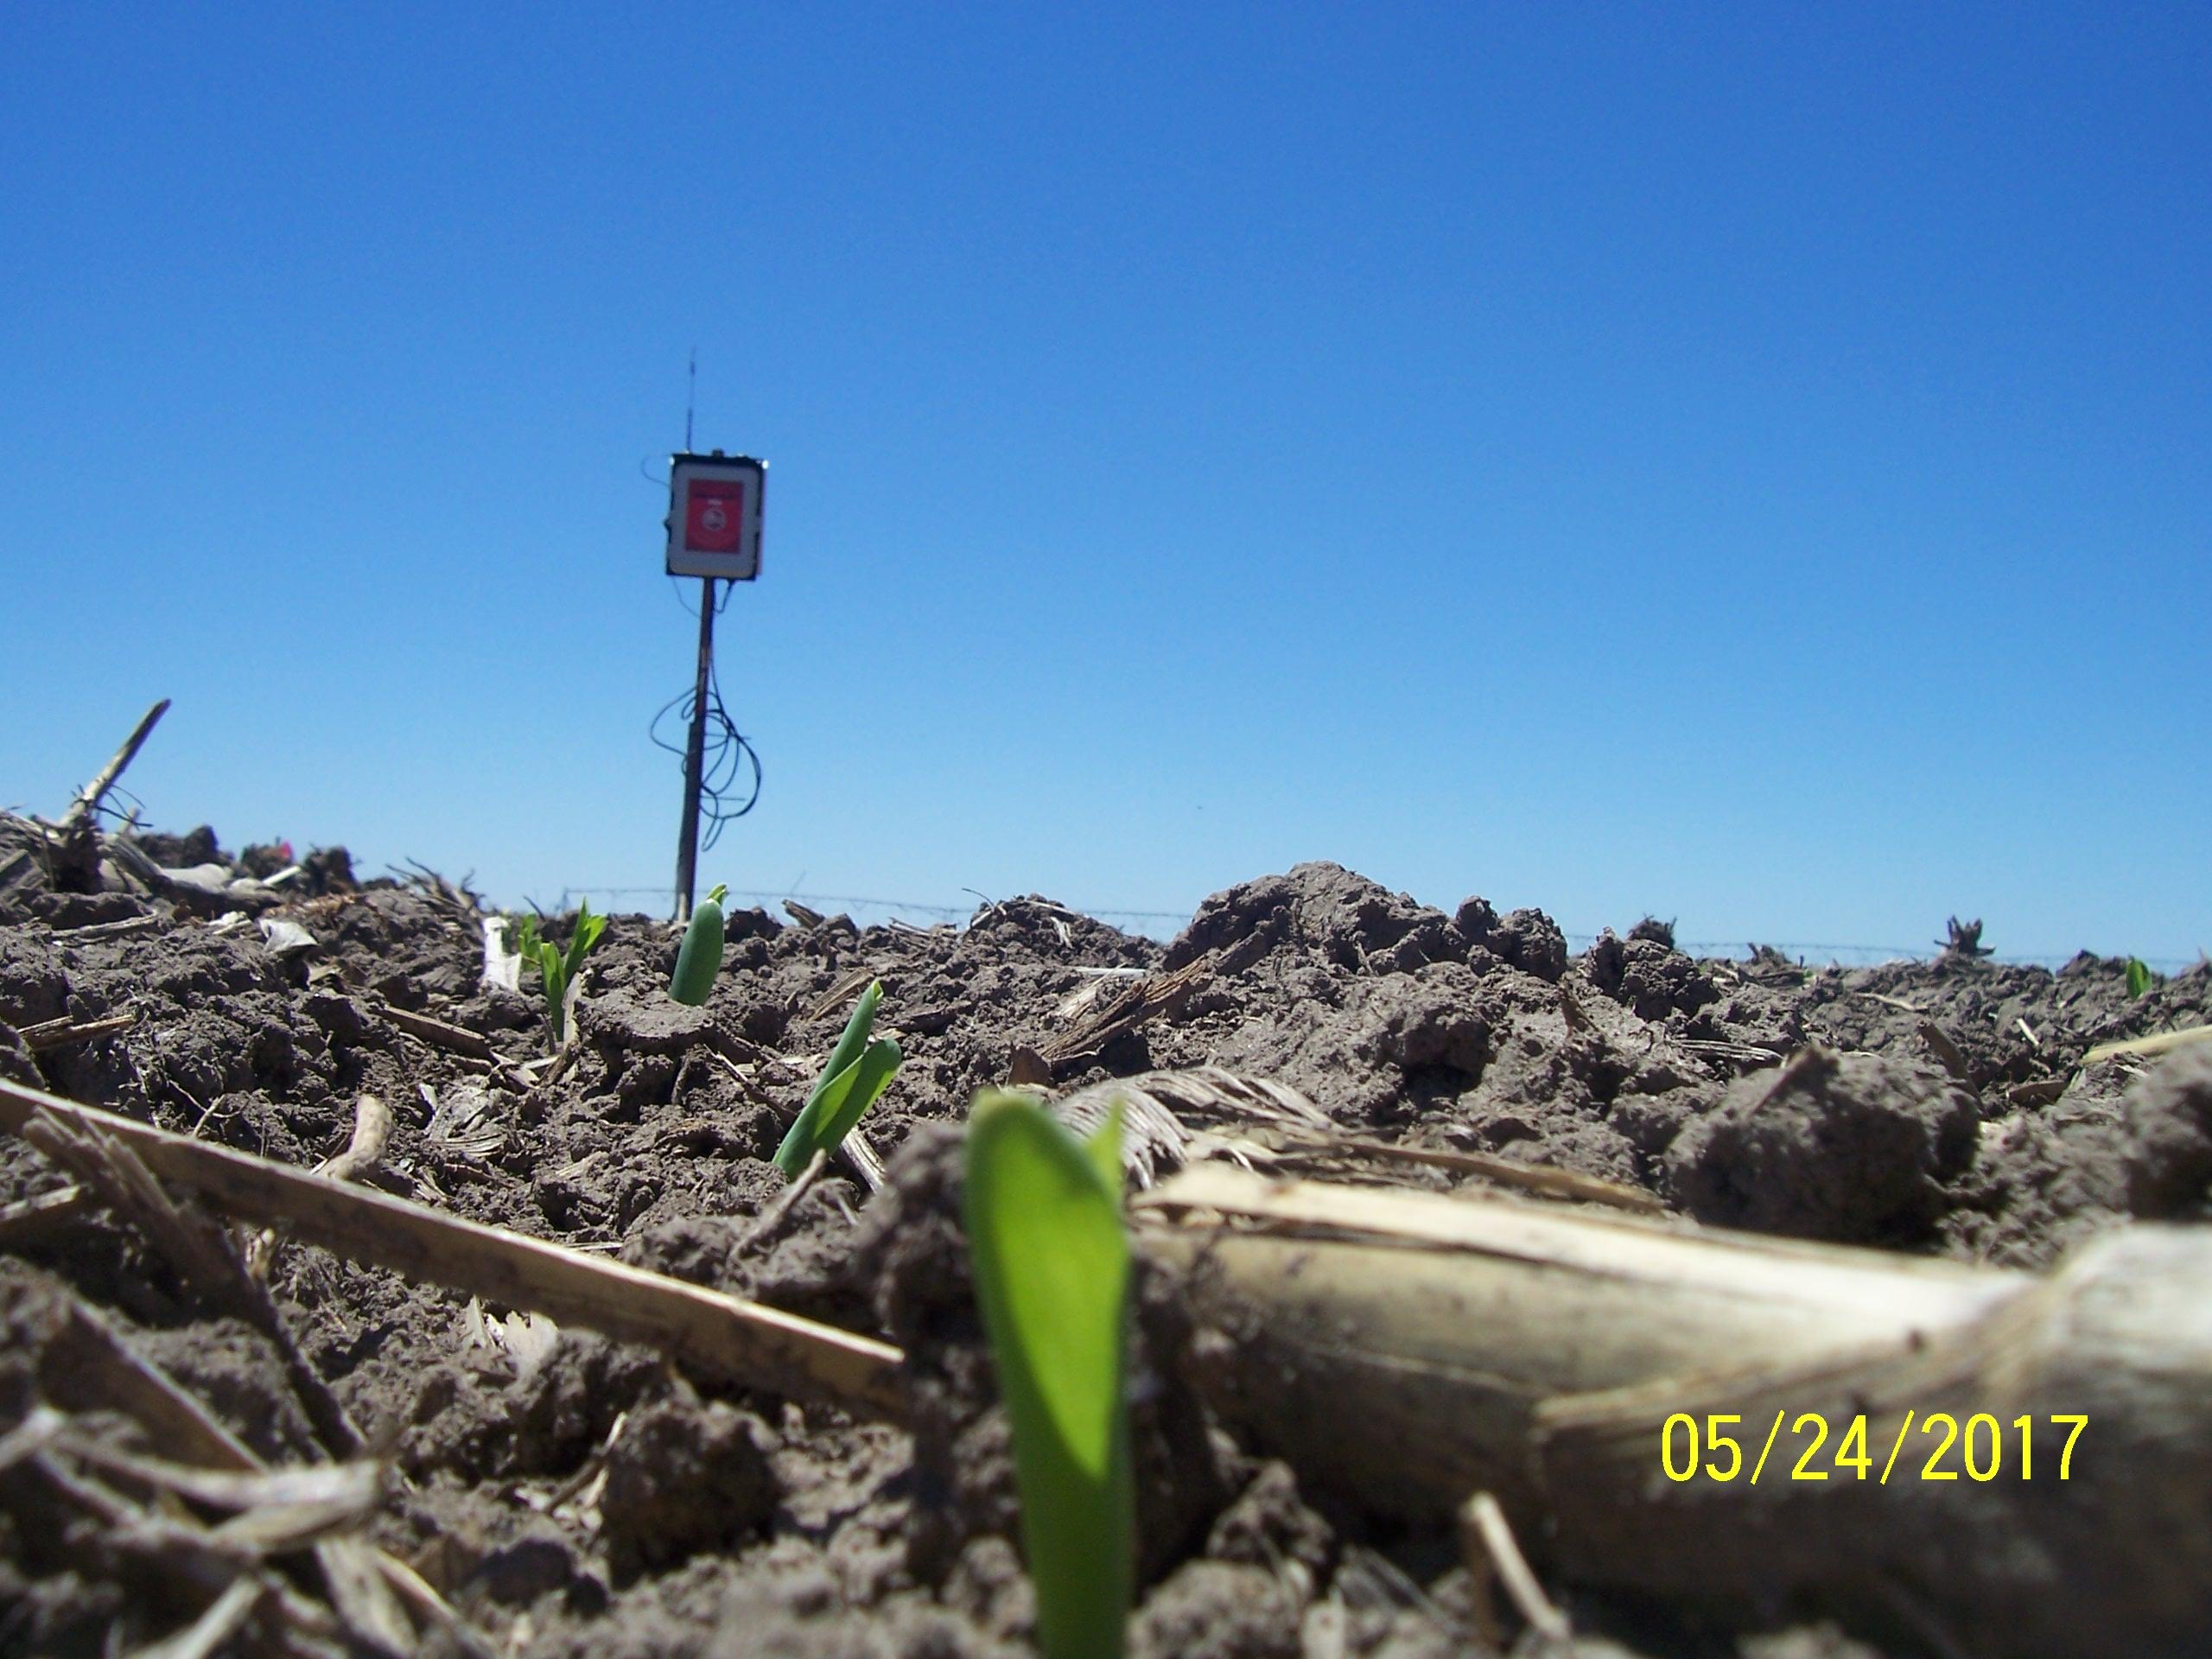 C-1 (Corn) SE4 16-31s-37w 5242017 100_3369